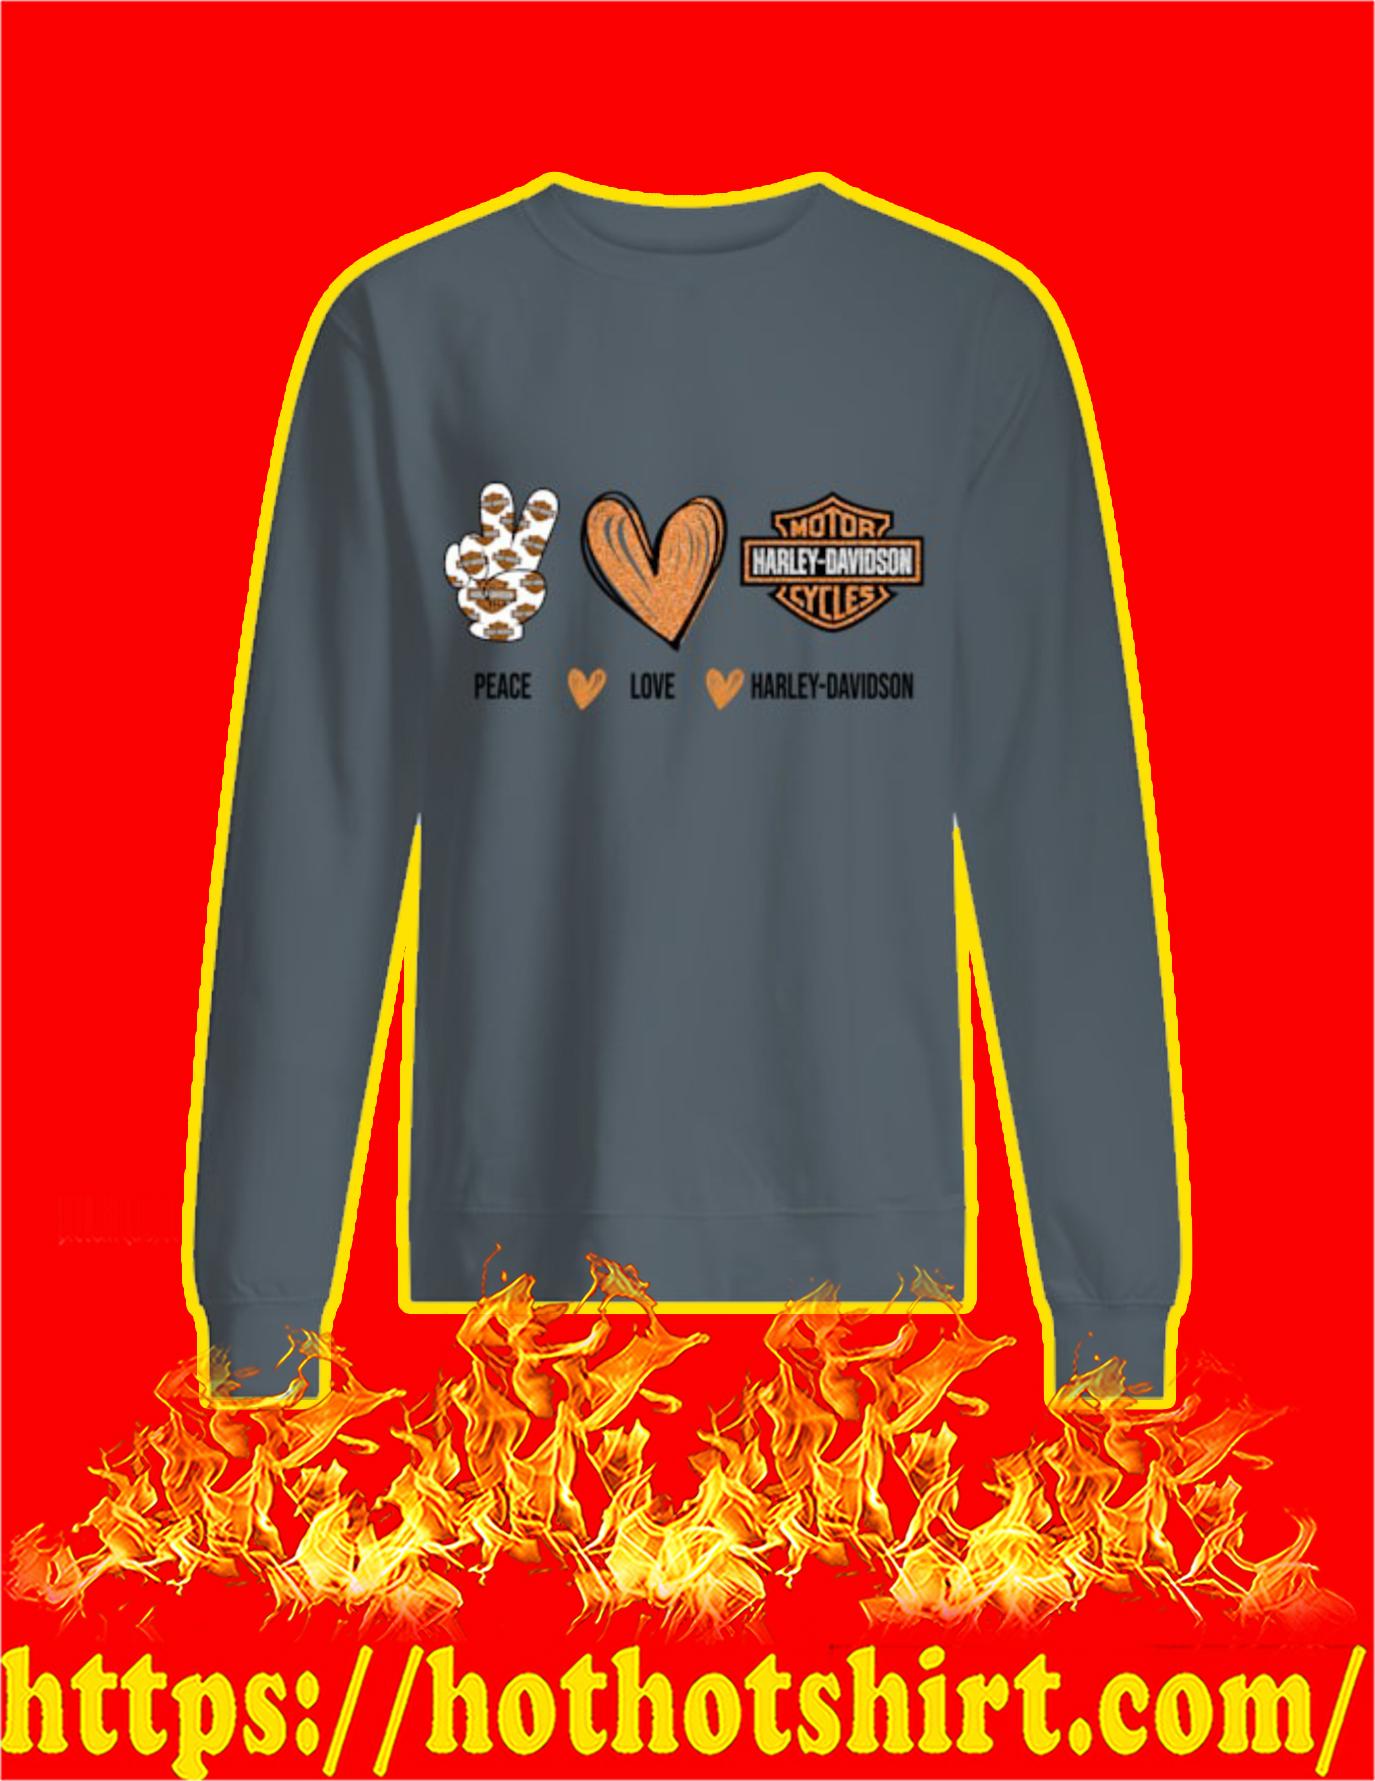 Peace Love Harley Davidson Sweatshirt